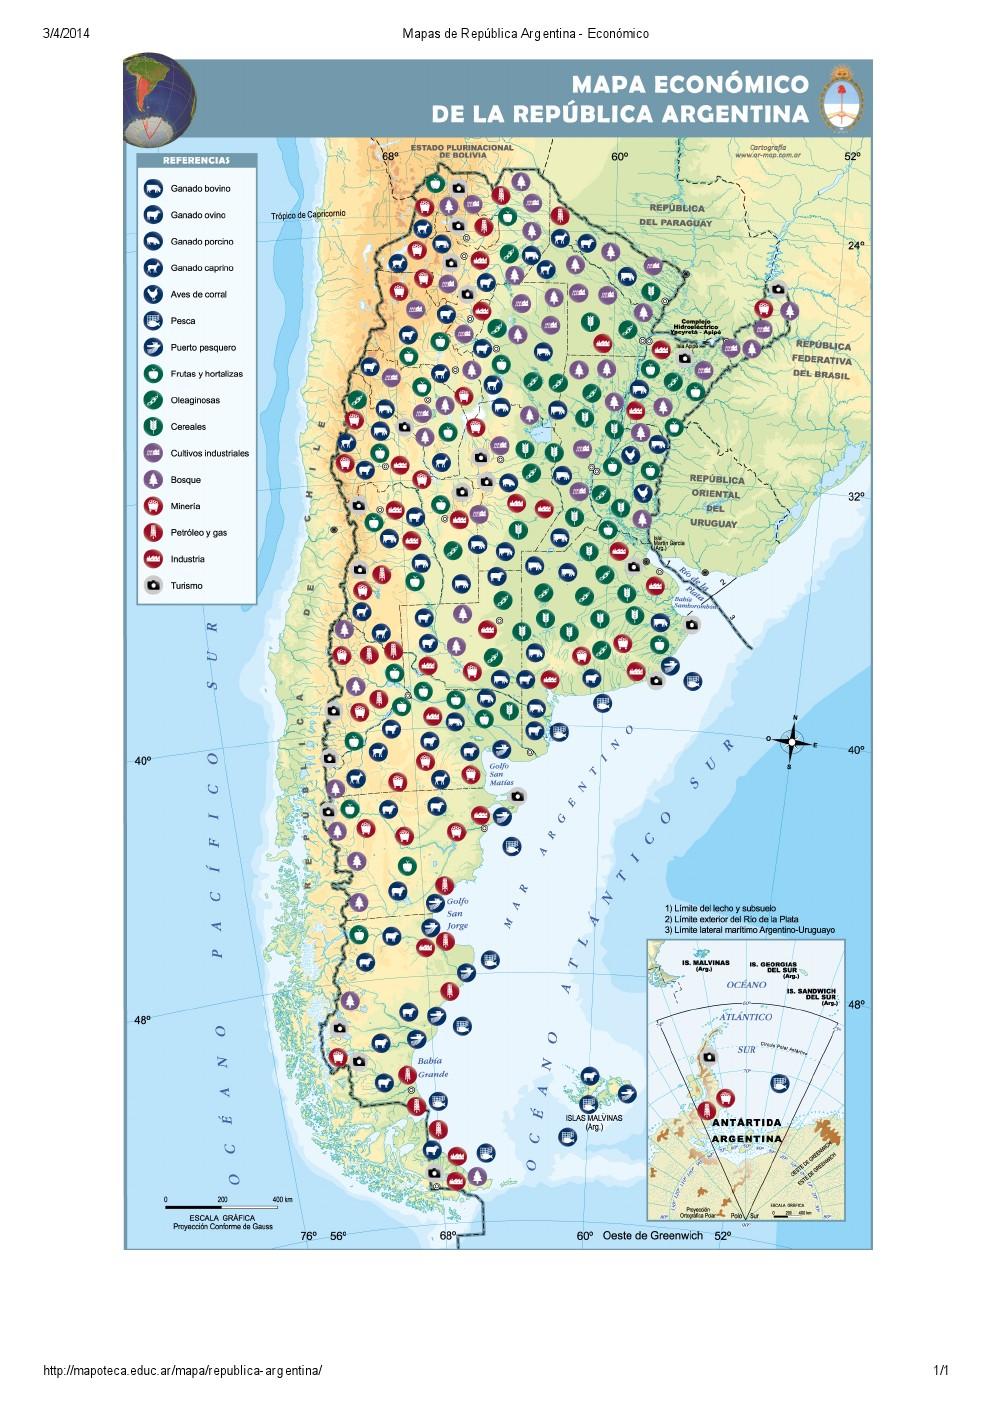 Mapa económico de Argentina. Mapoteca de Educ.ar